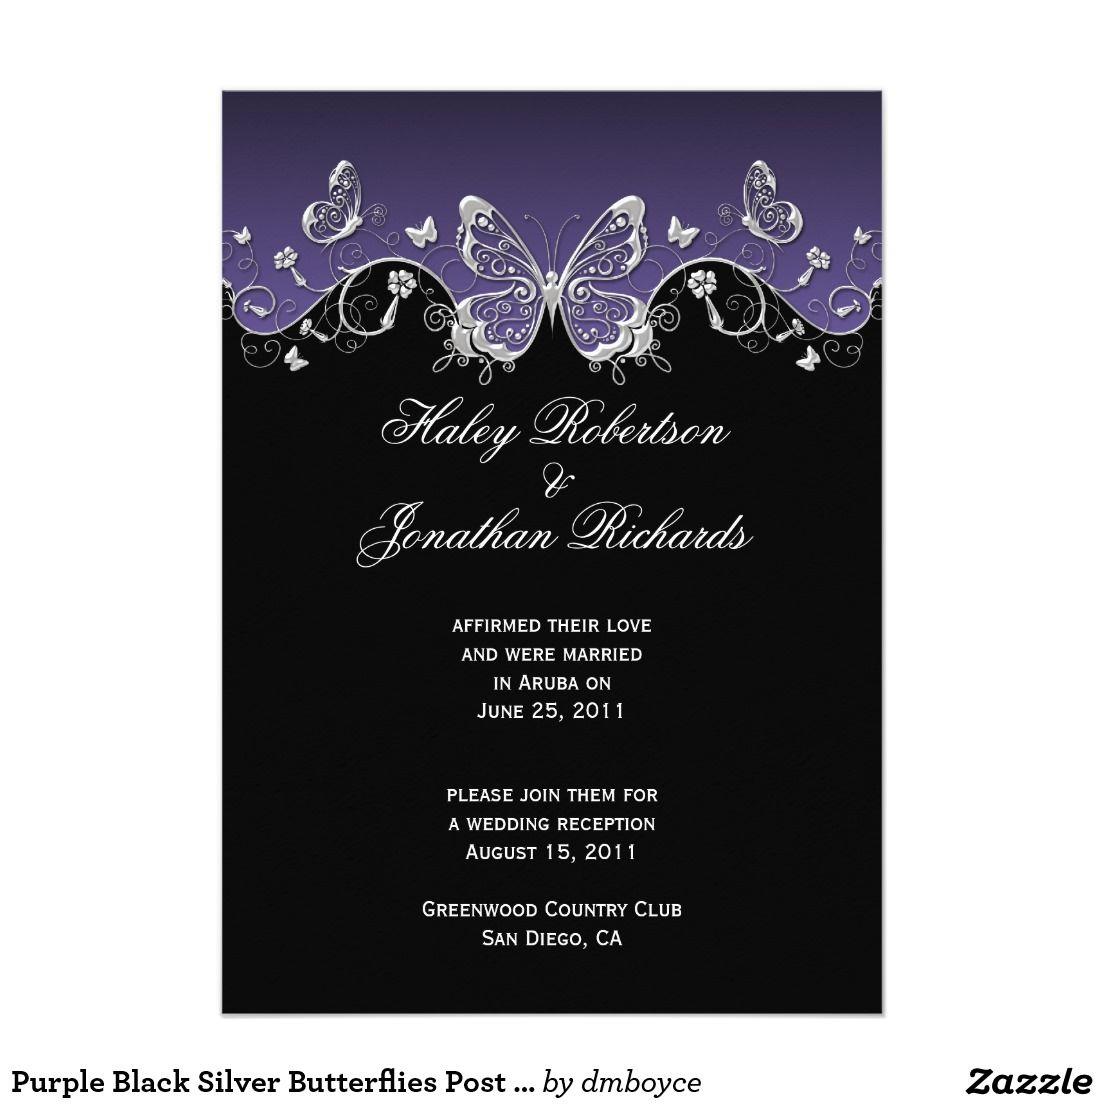 Purple Black Silver Butterflies Post Wedding Invitation | Pinterest ...